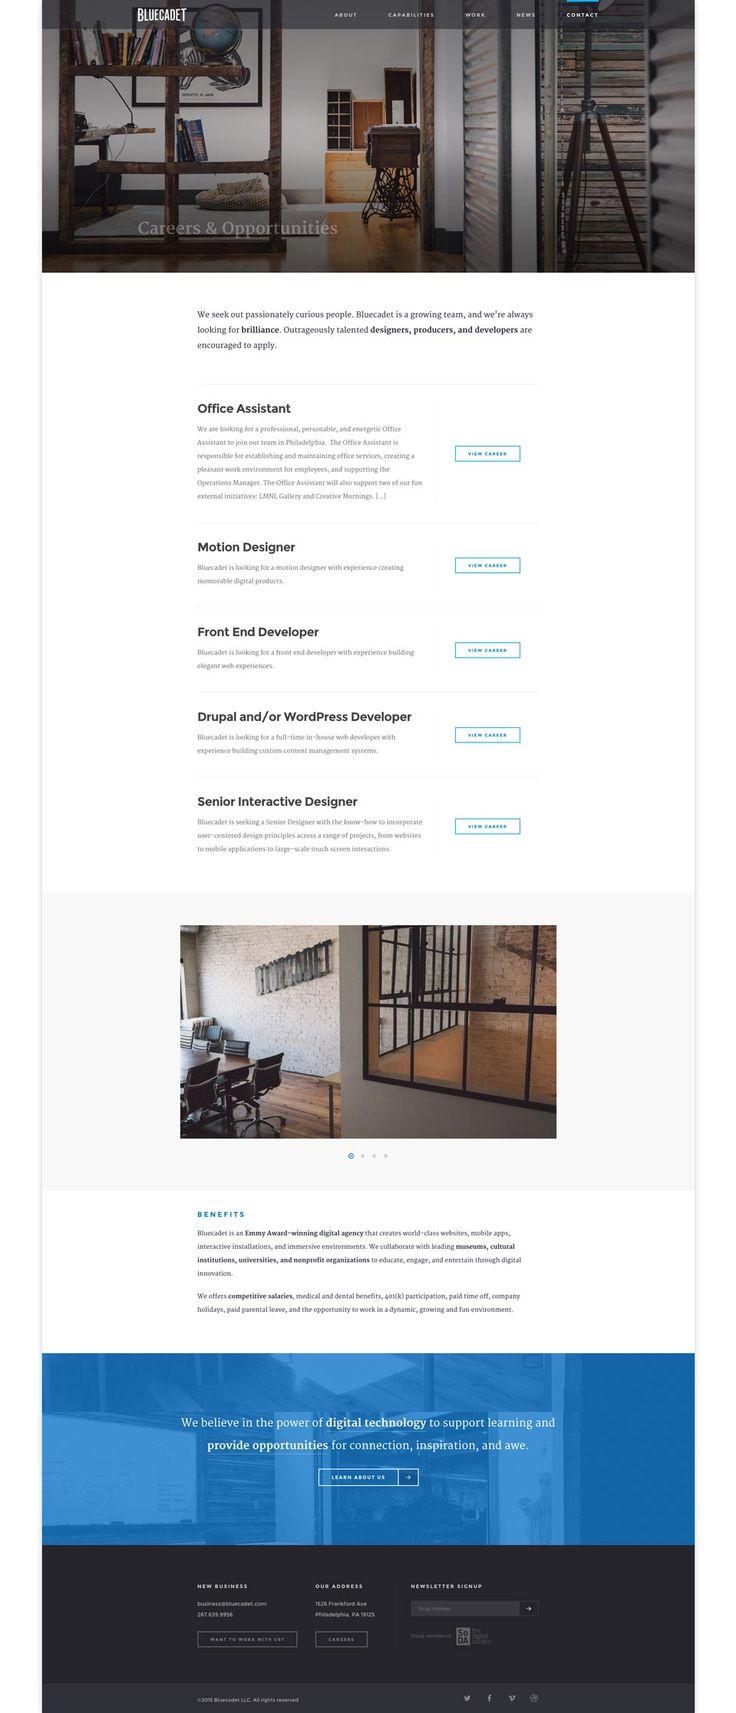 best images about ui careers list behance bluecadet jobs careers list webdesign